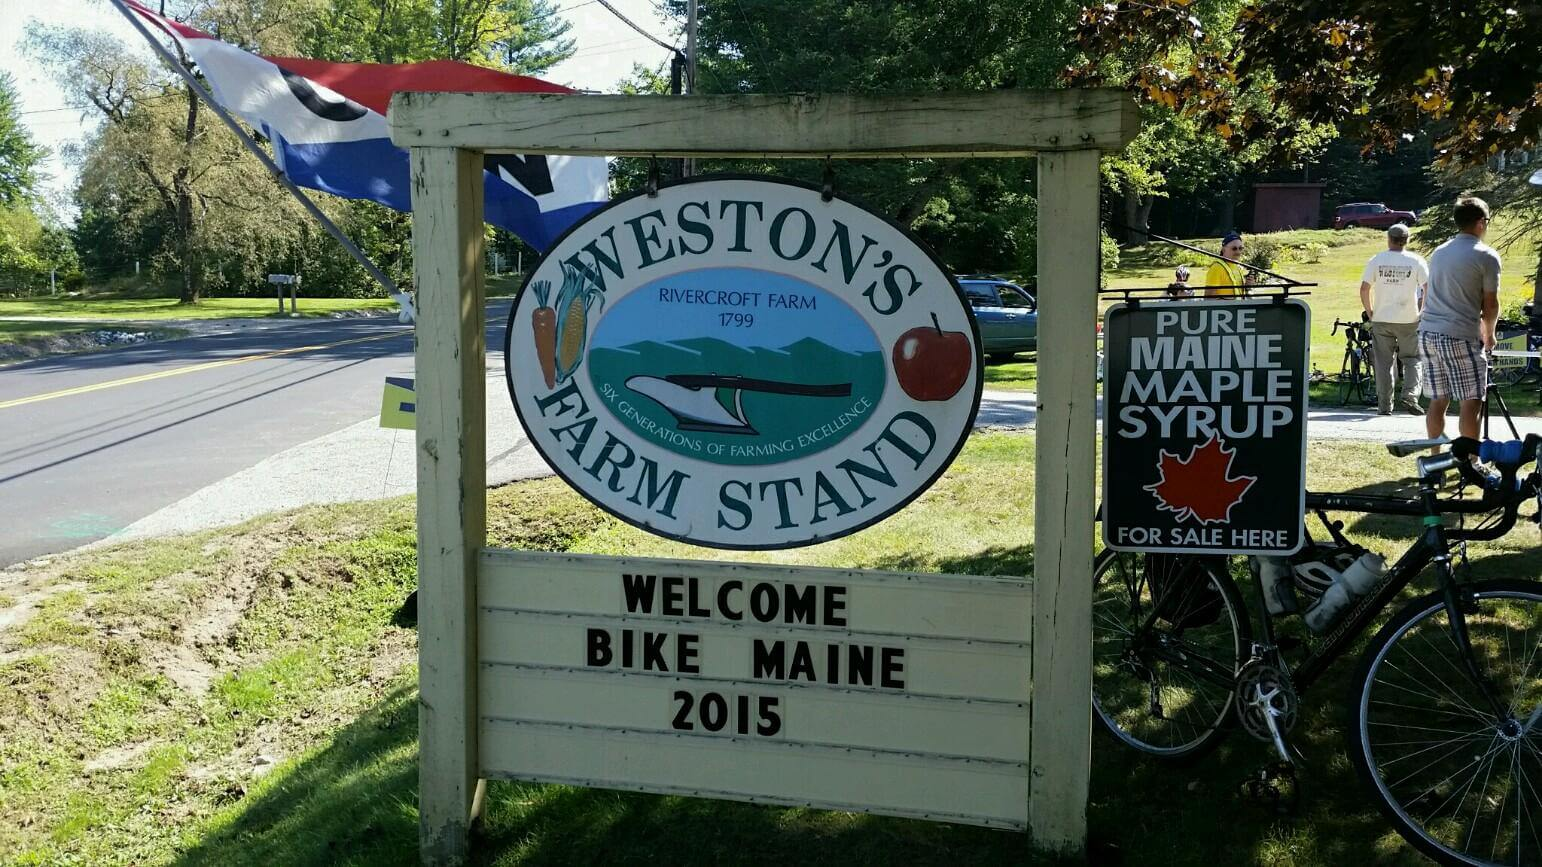 Weston's Farm Stand sign welcomes Bike Maine 2015